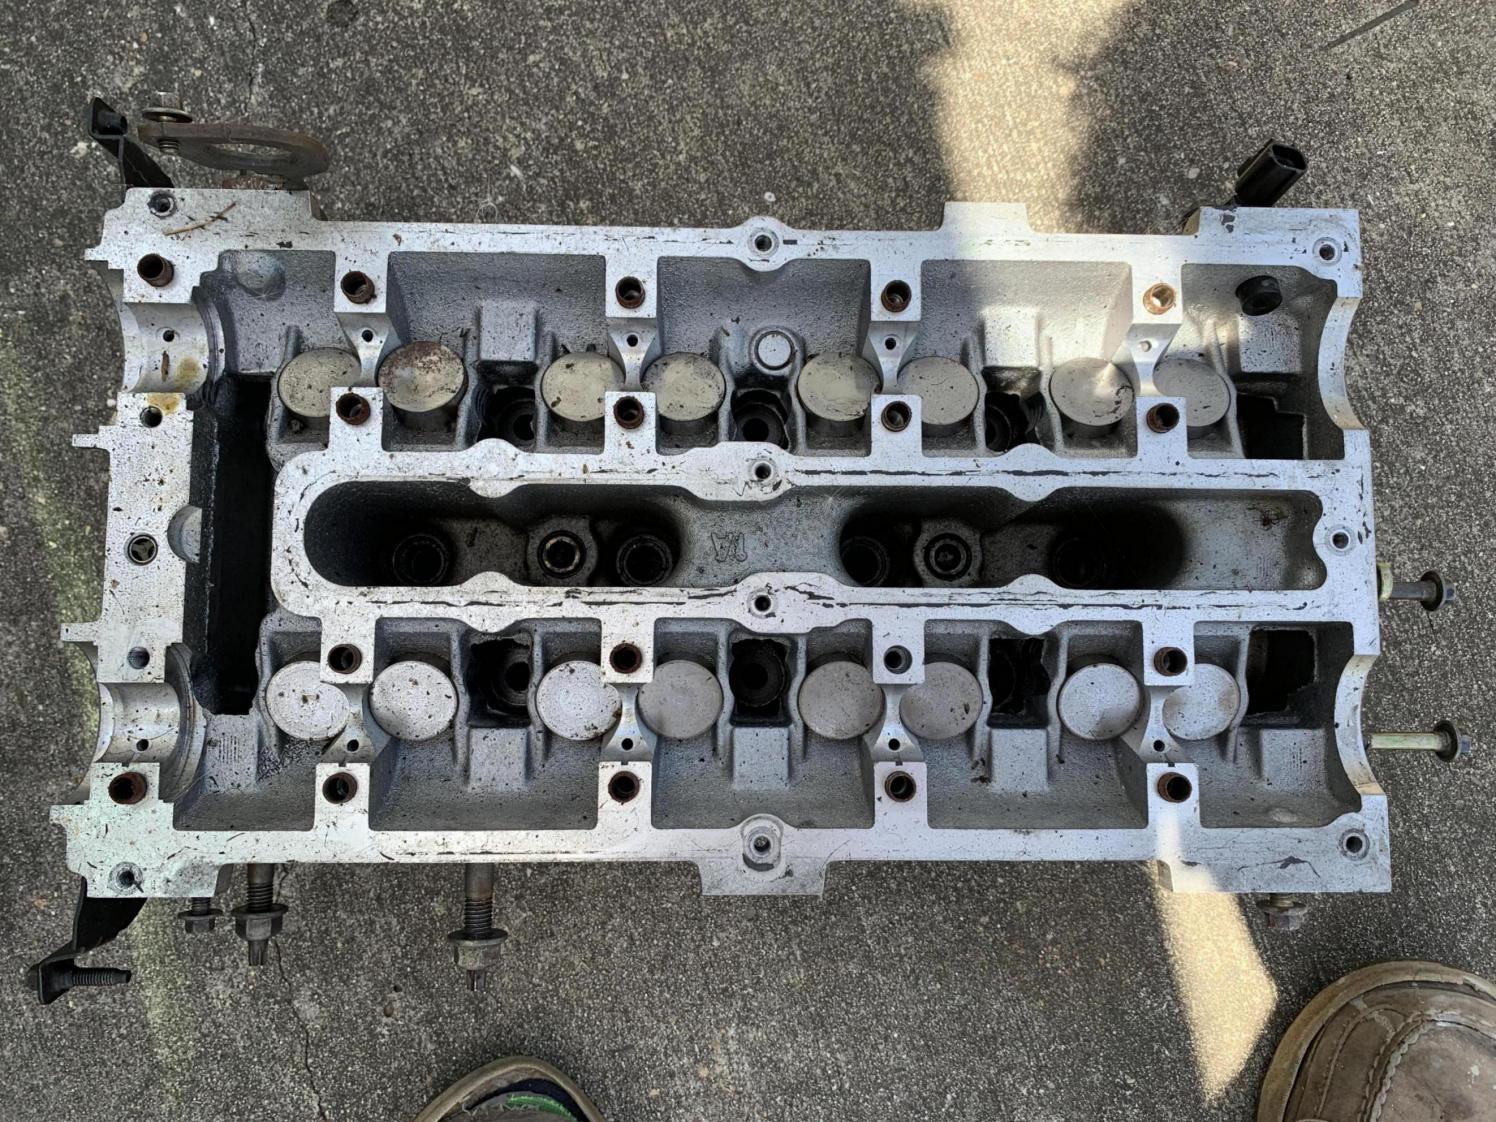 2004 SVTF EAP ZX5 (blown engine)-d7597650-4dd8-4aa4-b0a0-6f0009453e6d_1562681216280.jpg